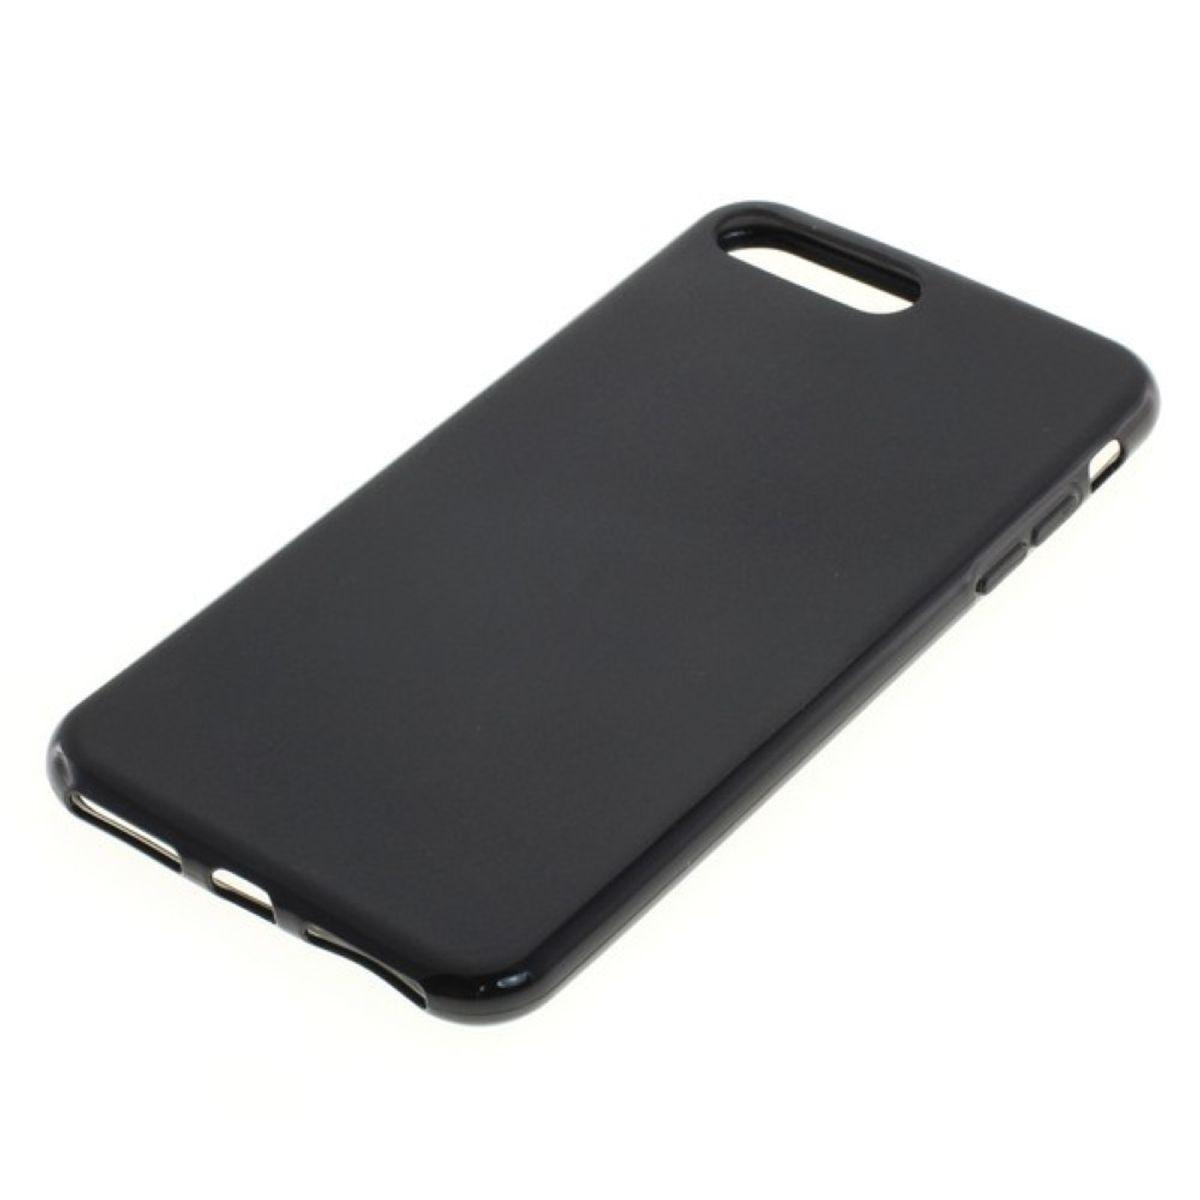 handyh lle tpu case f r handy apple iphone 7 plus schwarz. Black Bedroom Furniture Sets. Home Design Ideas